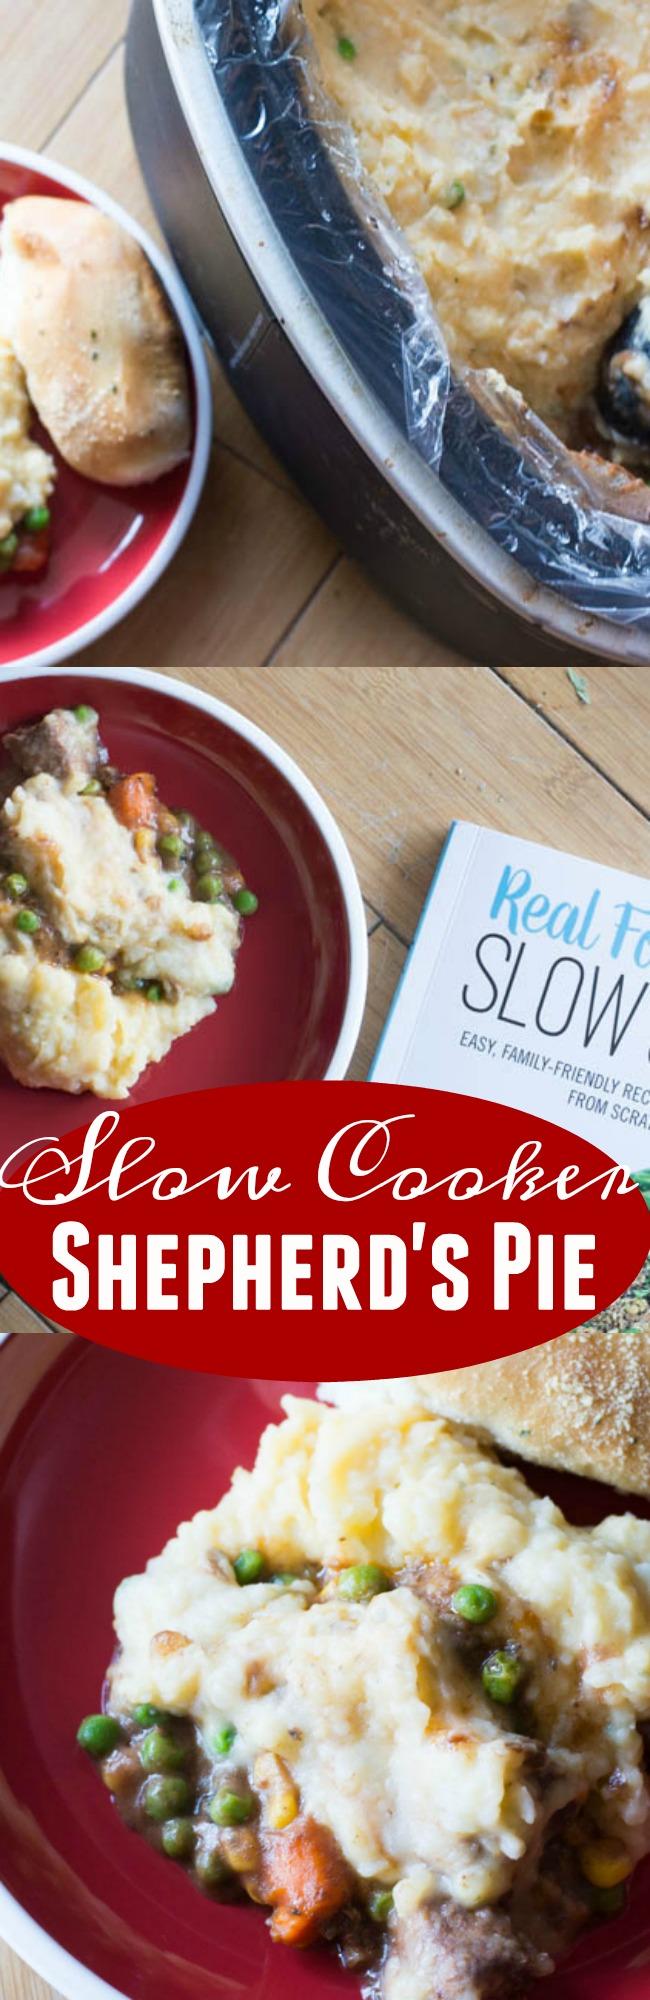 slow-cooker-shepherds-pie